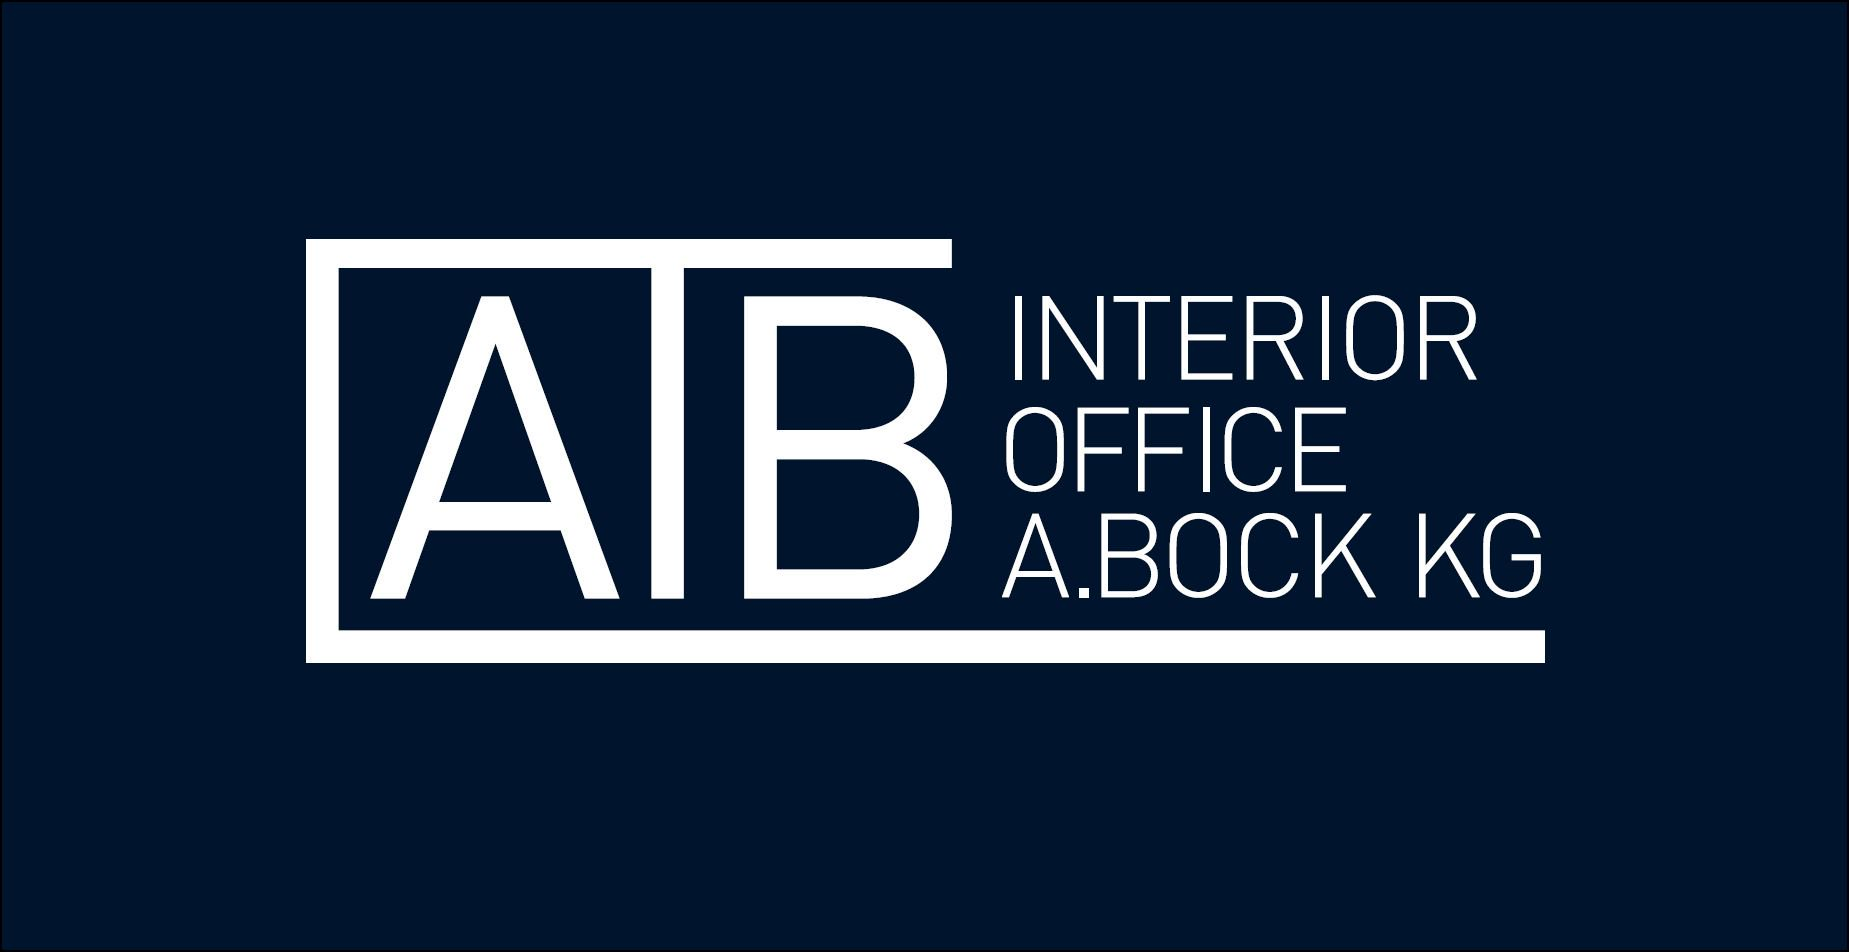 ATB interior